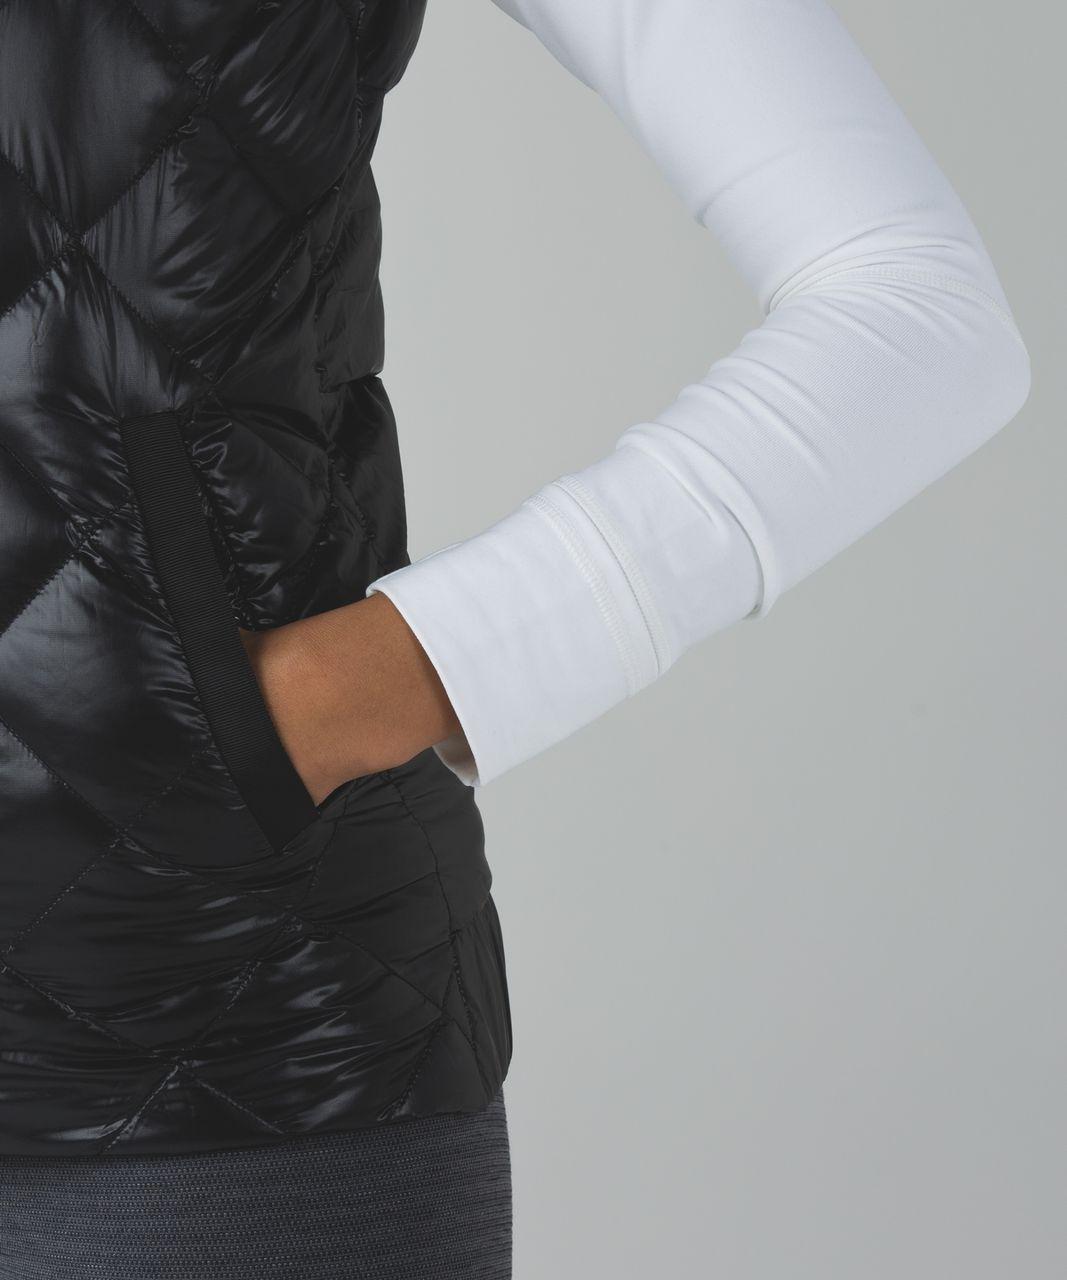 Lululemon The Fluffiest Vest - Black / Ziggy Snake Butter Pink Black